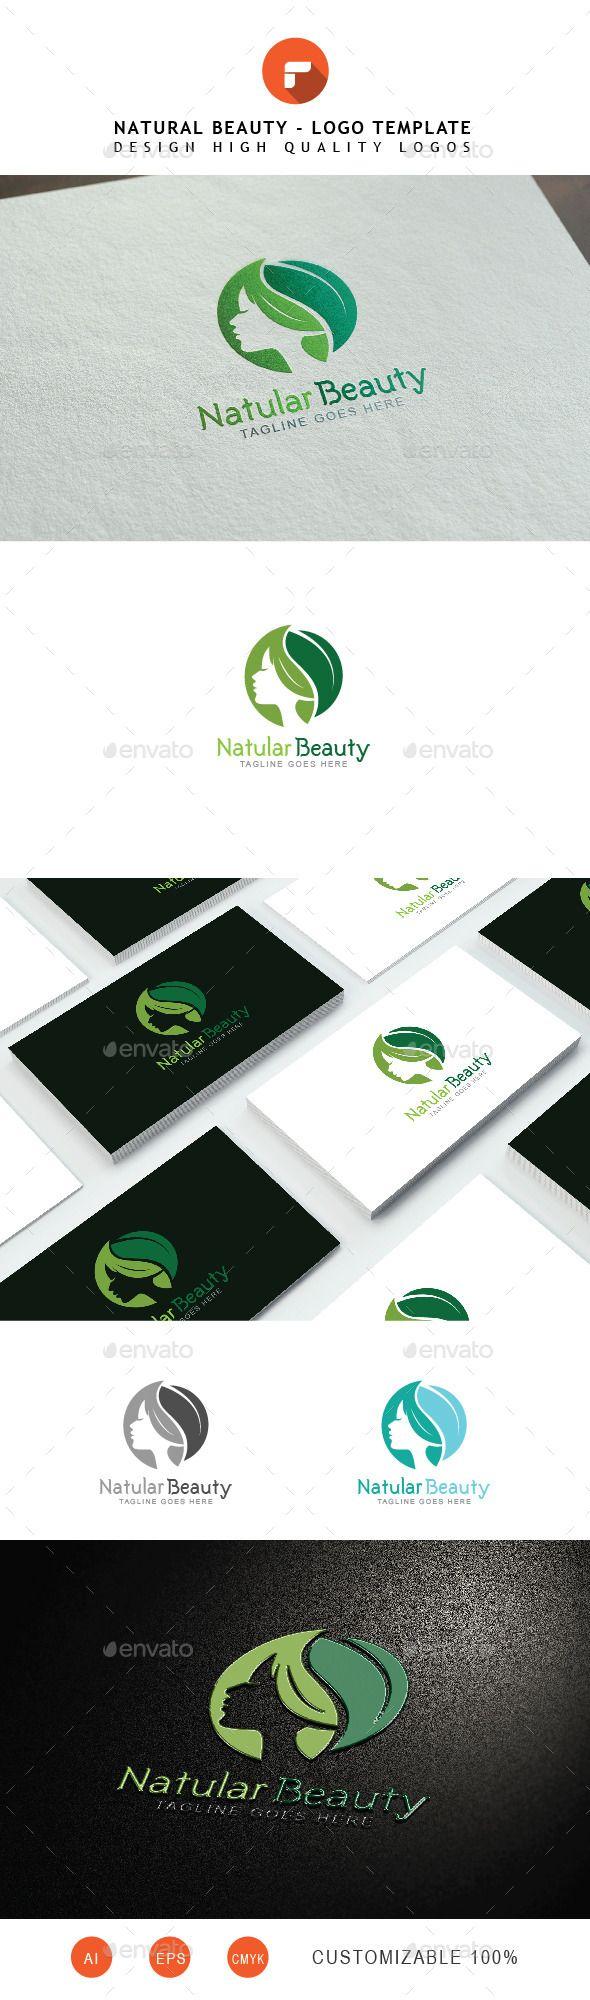 beauty, beauty center, bio, care, clean, cosmetic, dermatology, elegant, face, green, hair, health, herbal, leaf, medical, natural, pharmacy, salon, simple, spa, treatment, wellness, woman